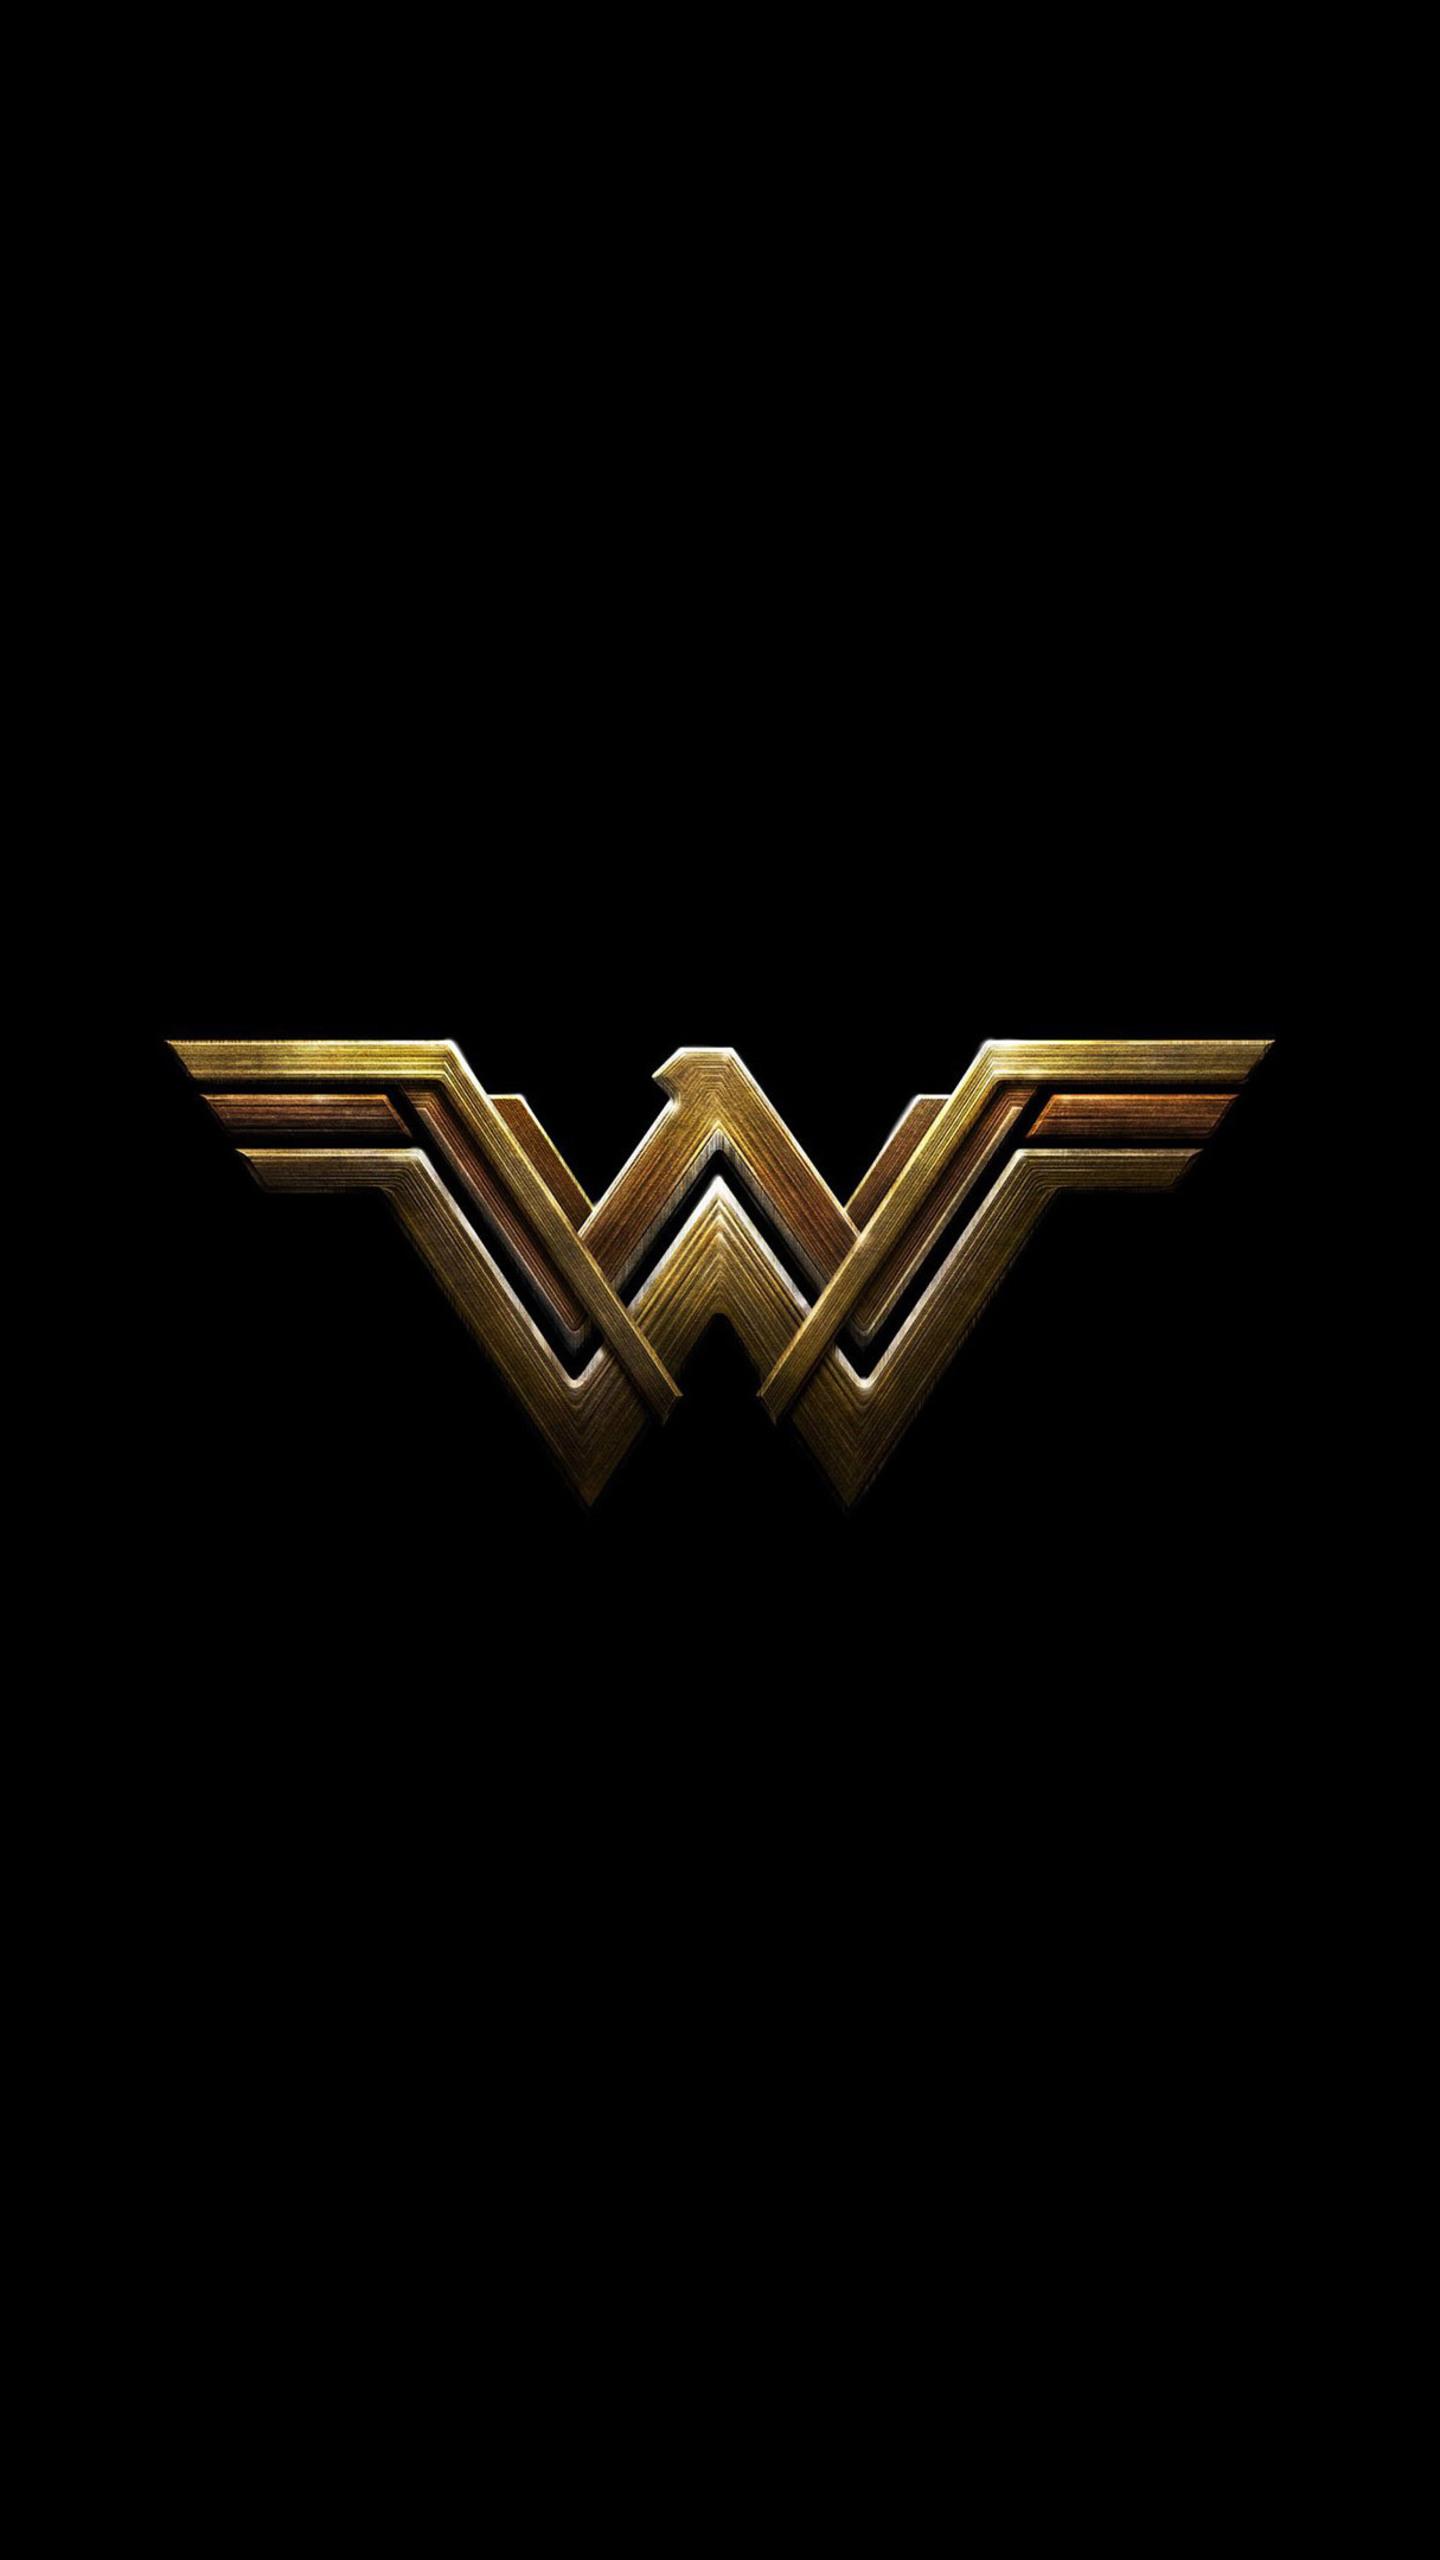 1440x2560 Wonder Woman Dark Logo 4k Samsung Galaxy S6,S7 ,Google